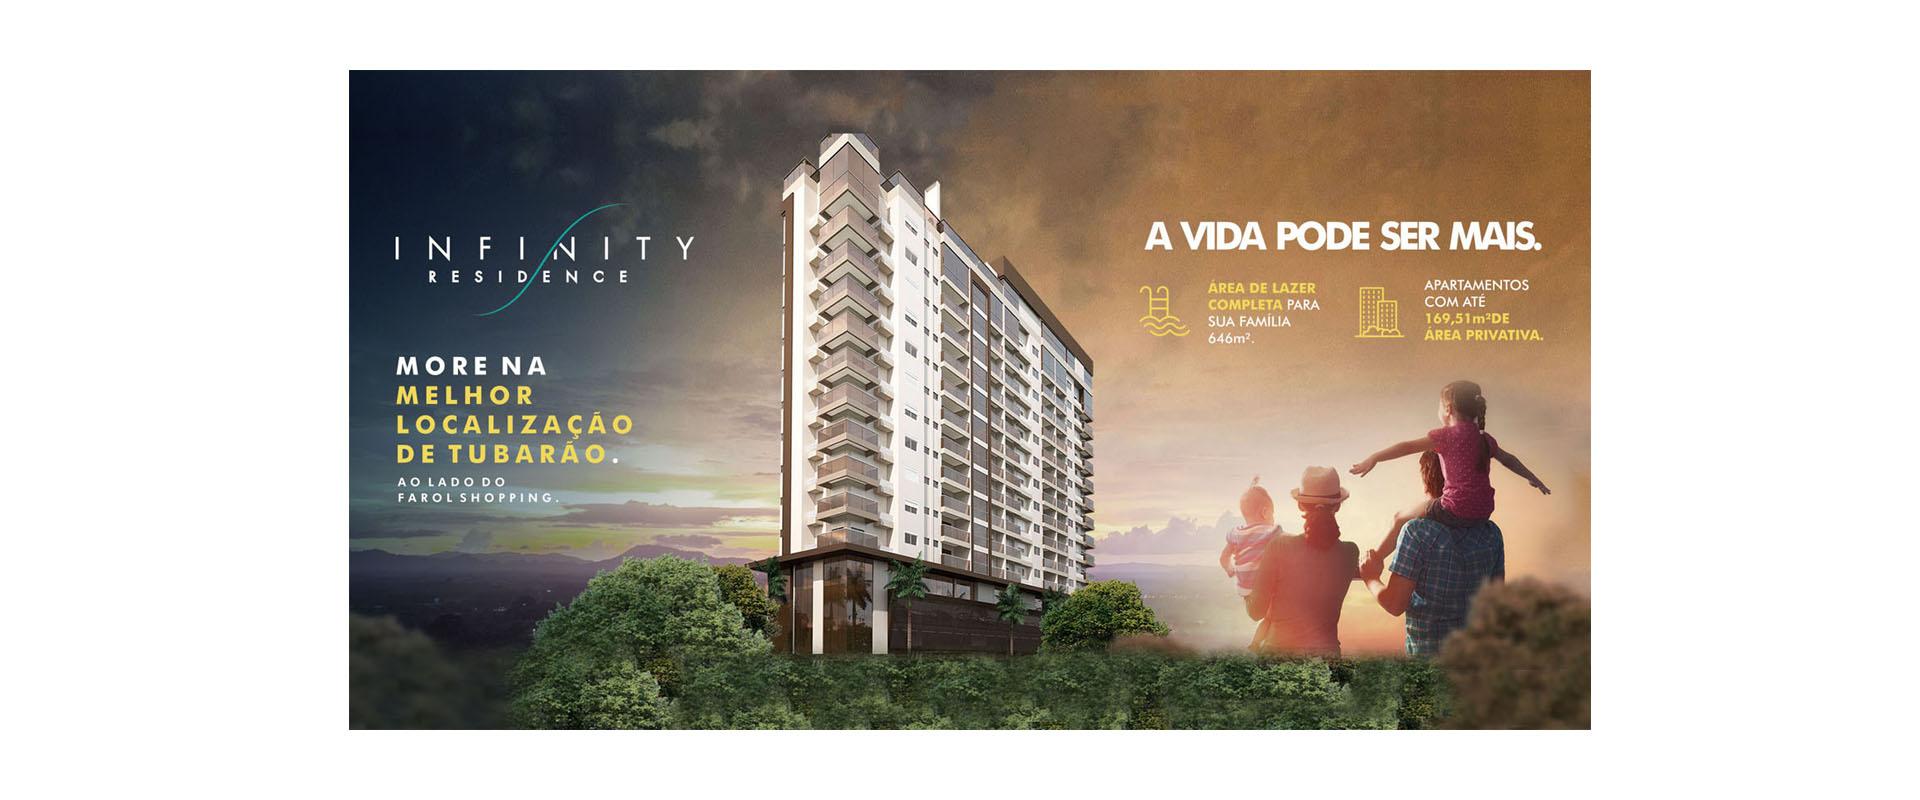 Infinity Residence Vila Moema Tubarão